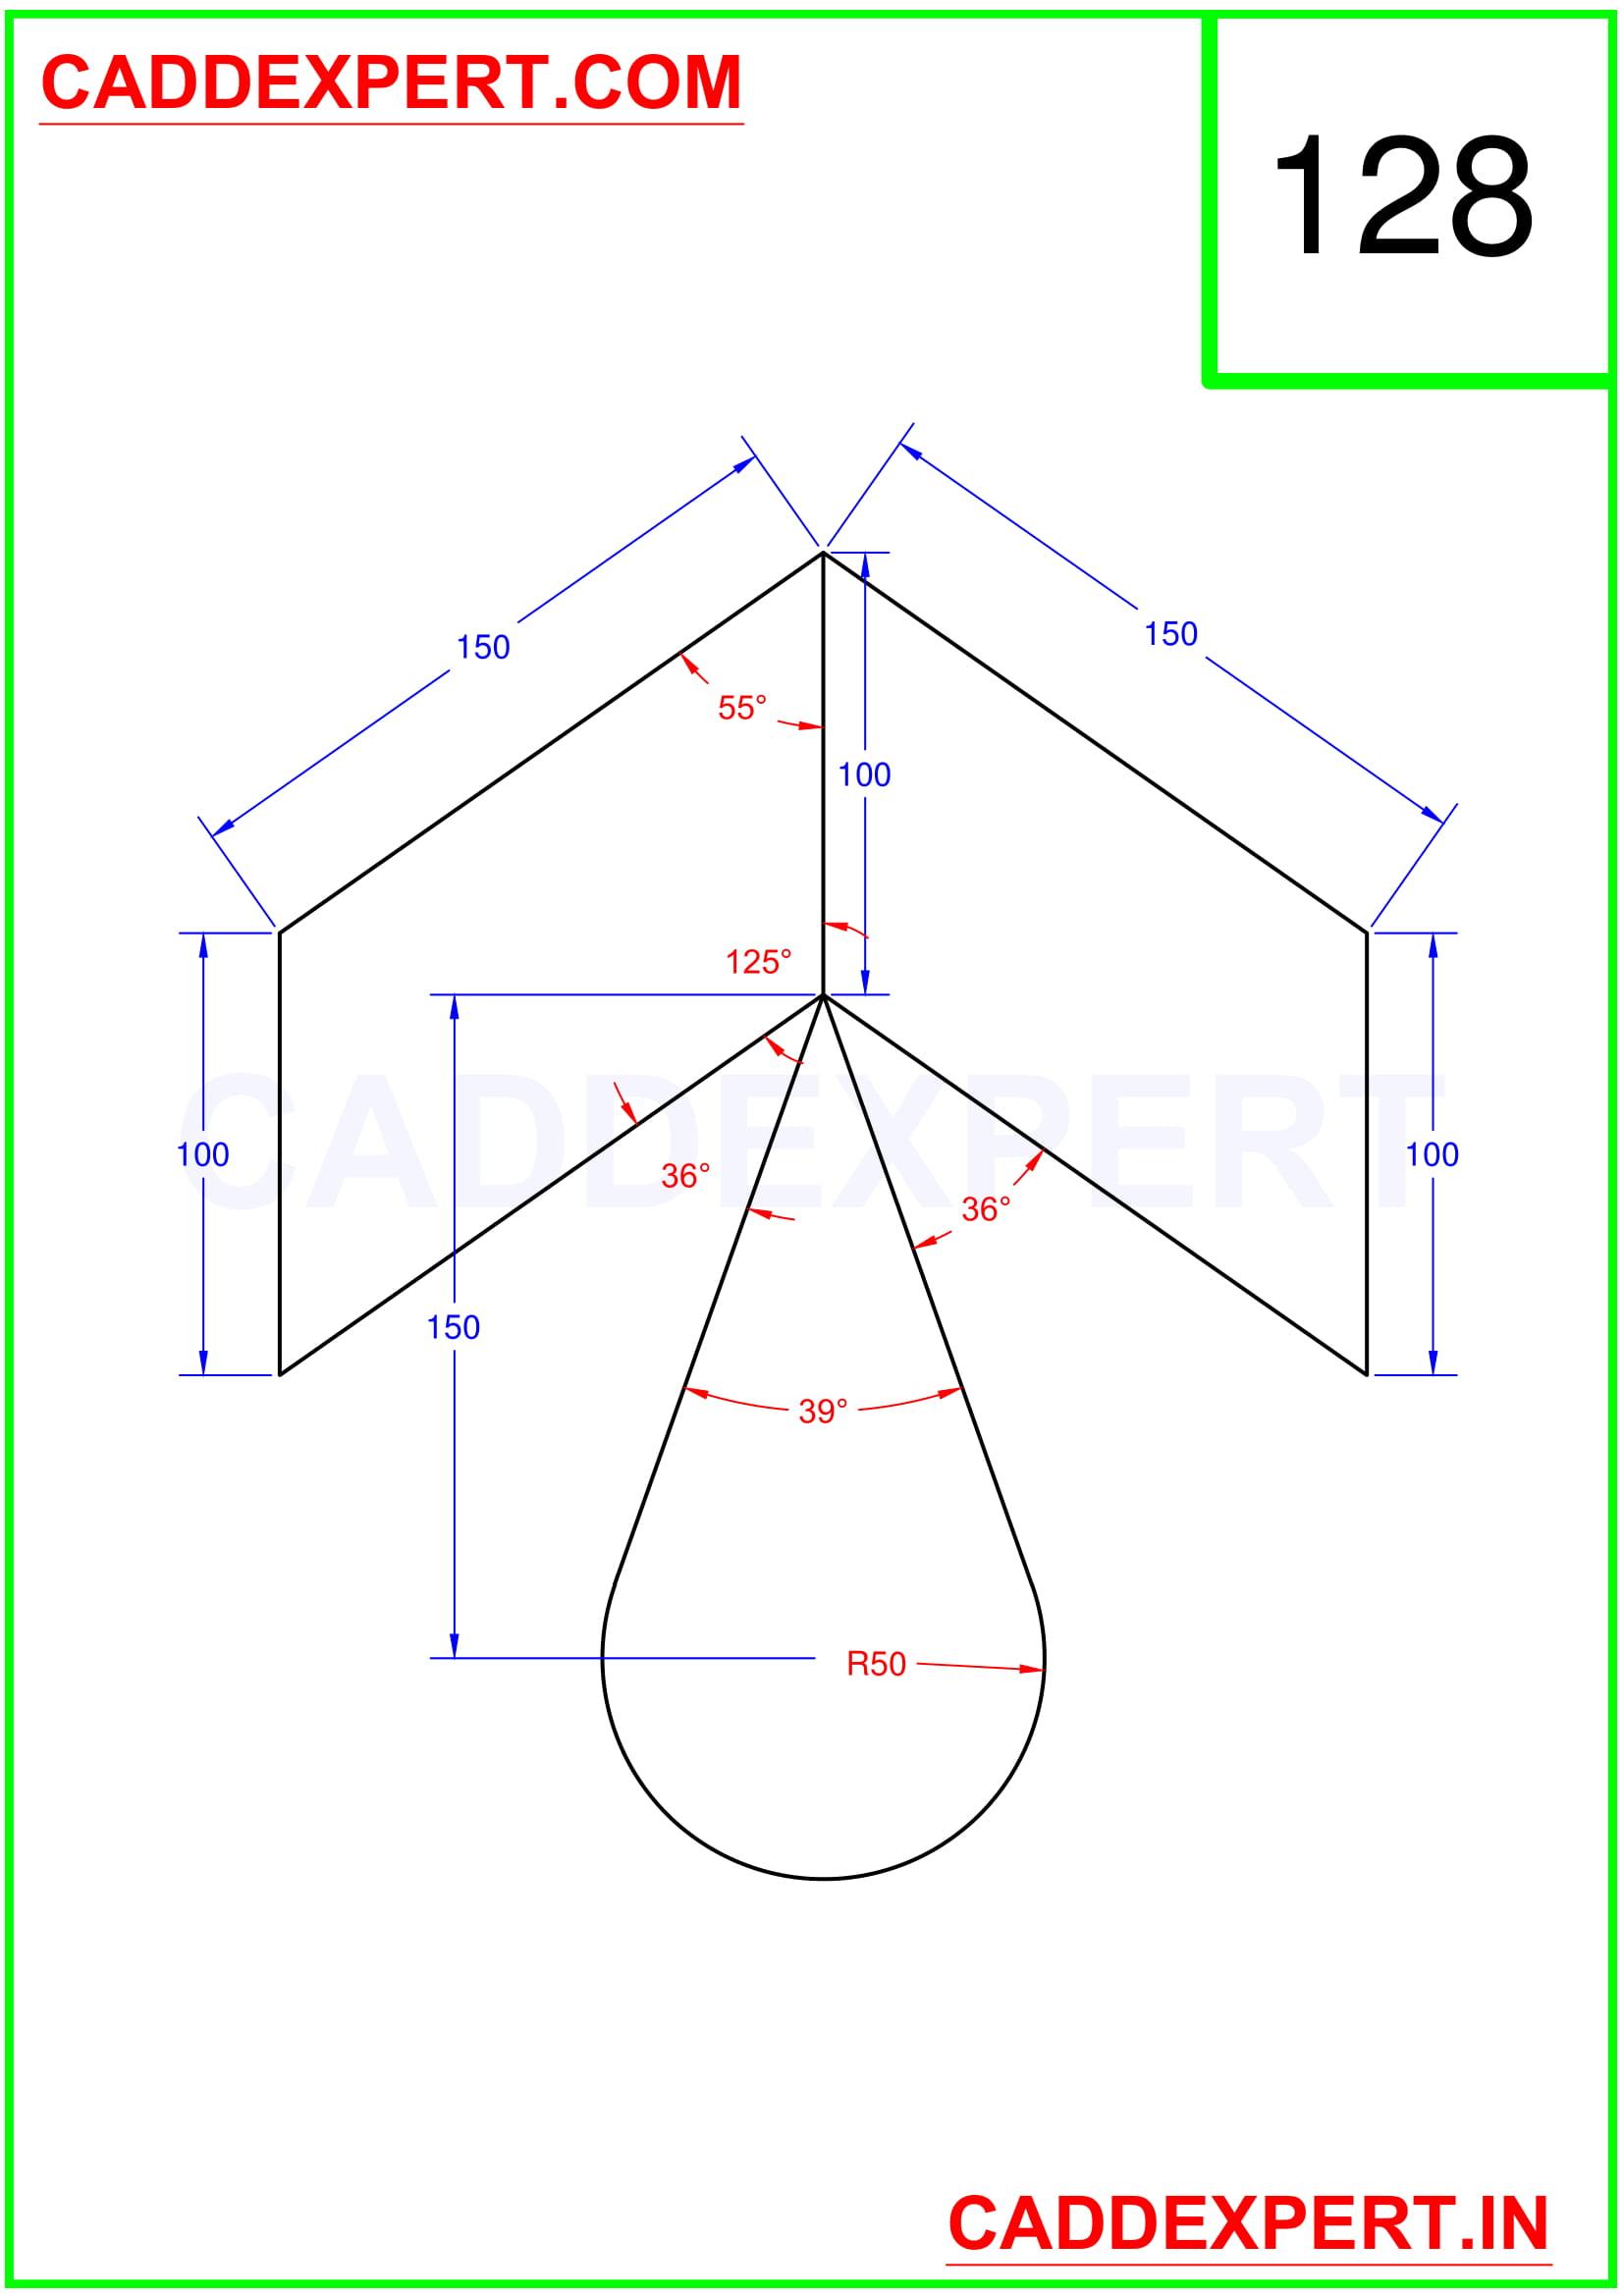 AUTOCAD 2D DRAWING PDF - 8